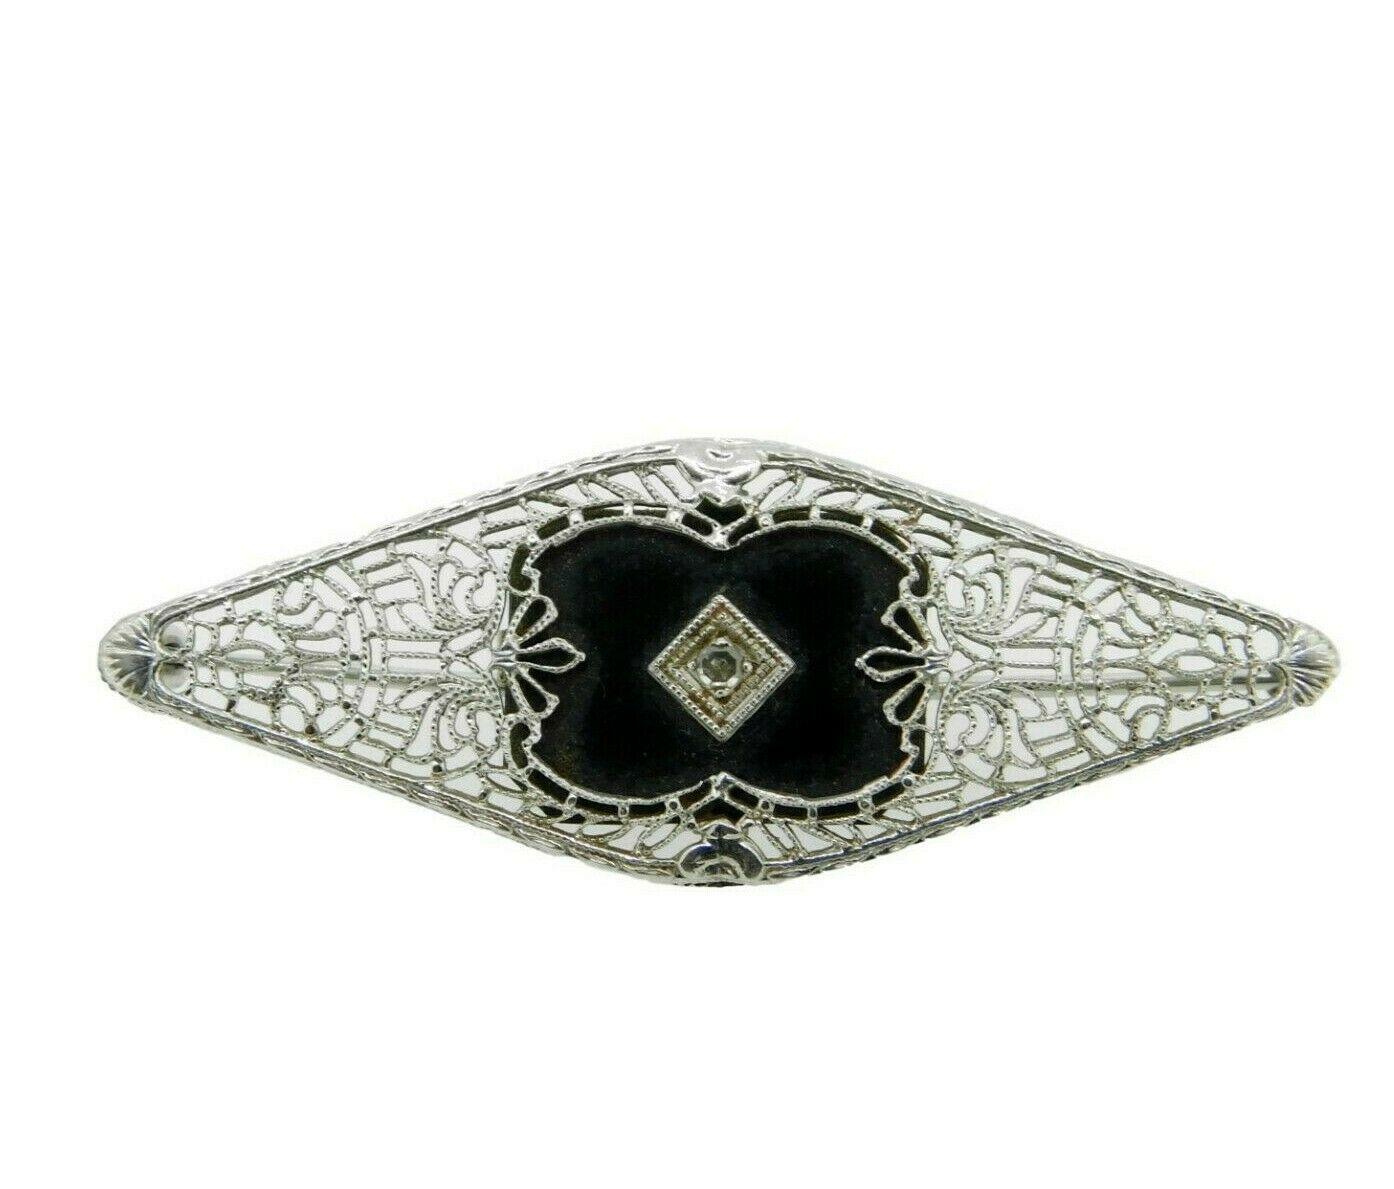 10k White Gold Filigree Genuine Natural Onyx and Diamond Pin (#J4661) - $255.00